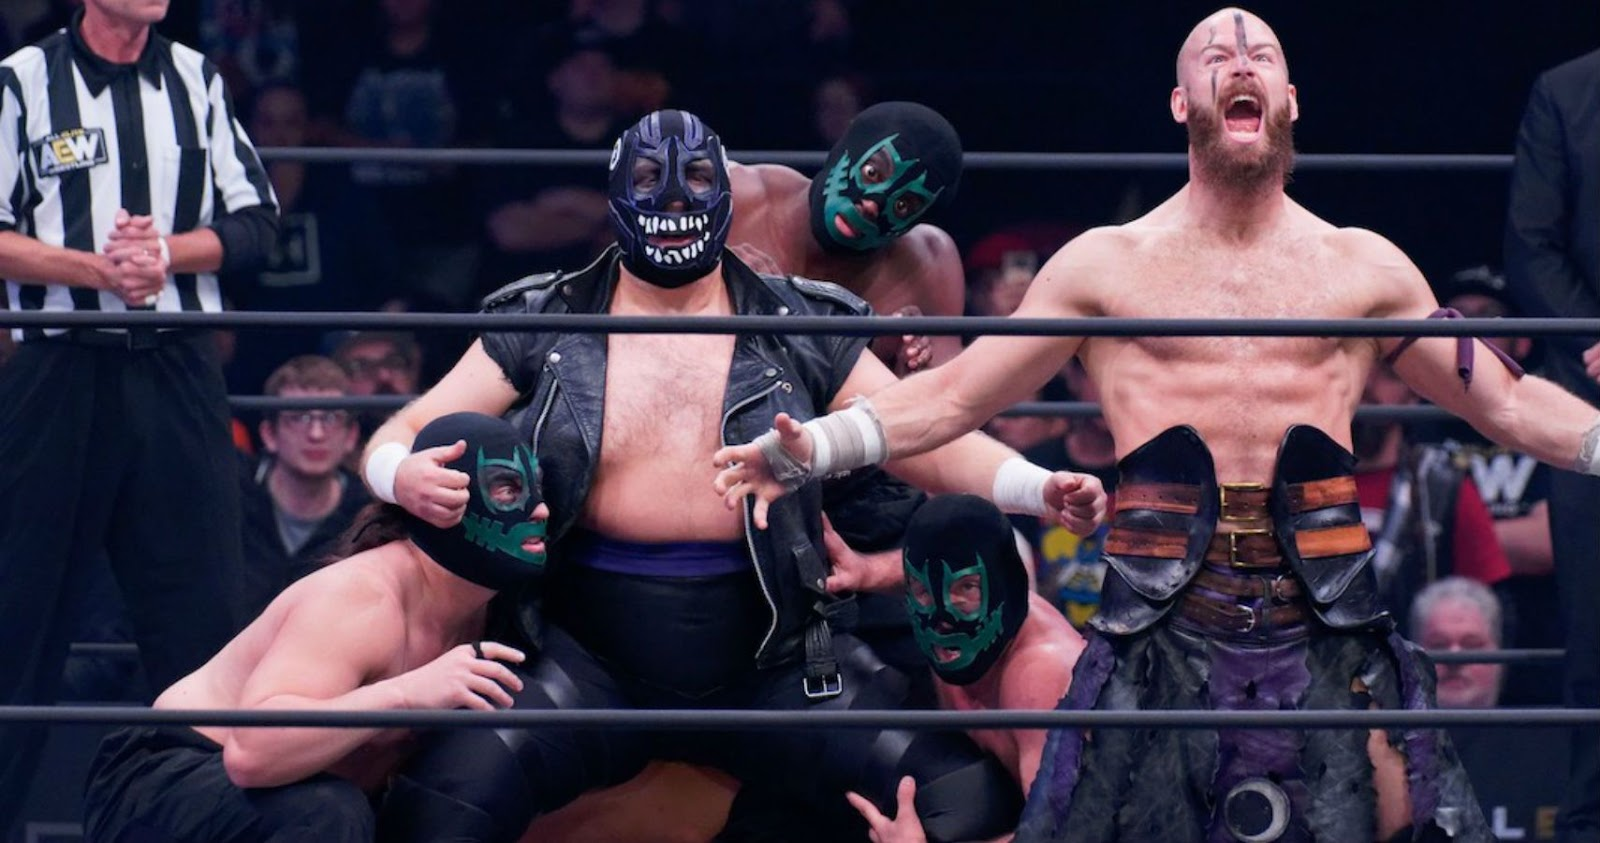 AEW utiliza erro grotesco do Dynamite para promover storyline